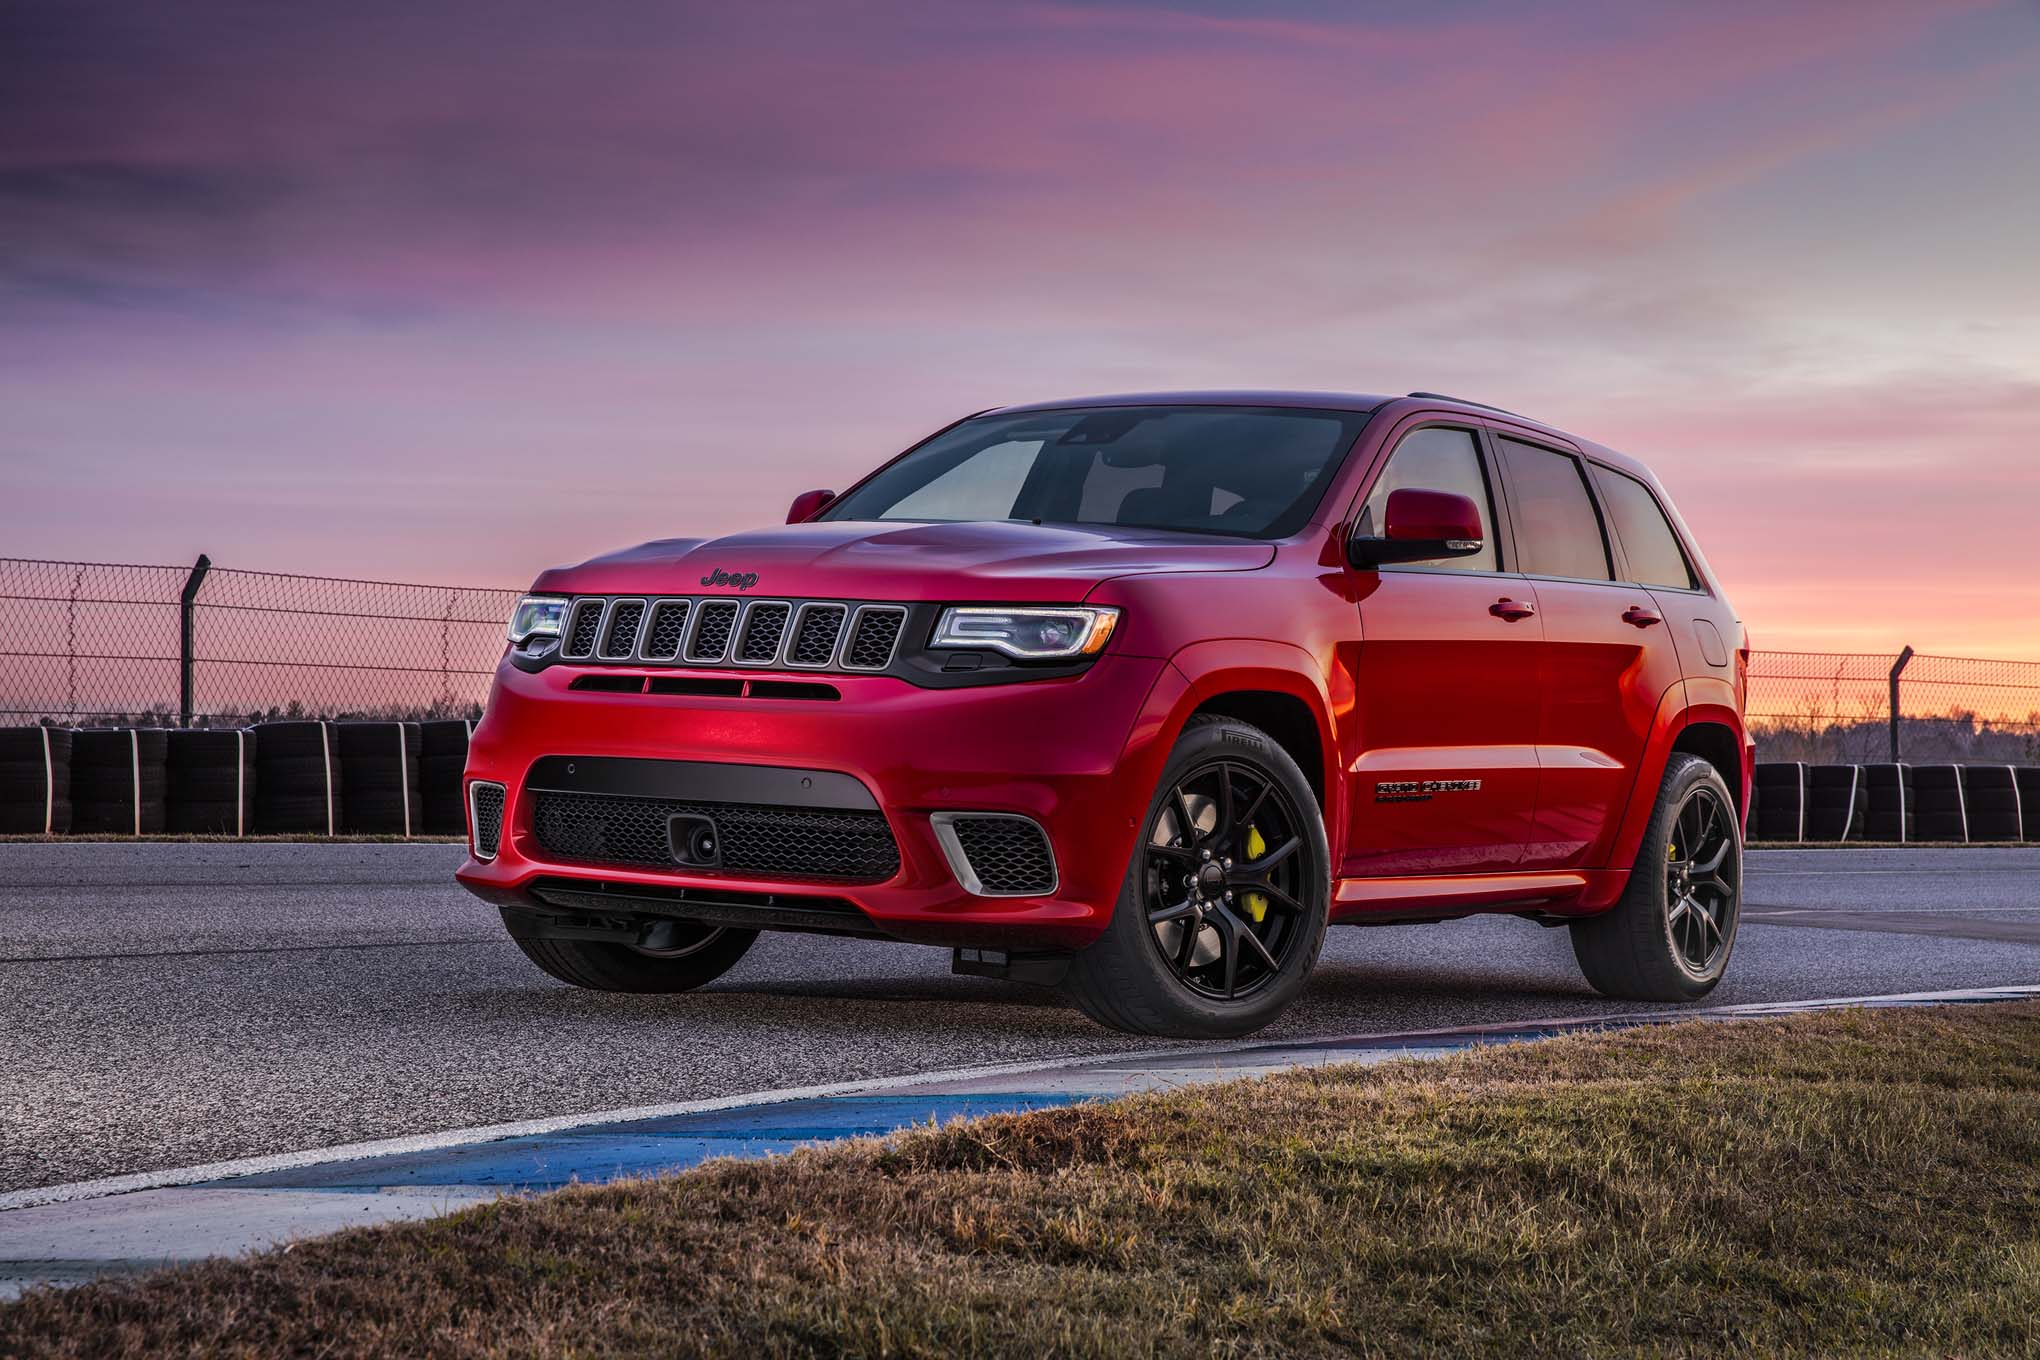 2018 Trackhawk Jeep >> Jeep Grand Cherokee Trackhawk 2018: Primer Vistazo - Motor Trend en Español